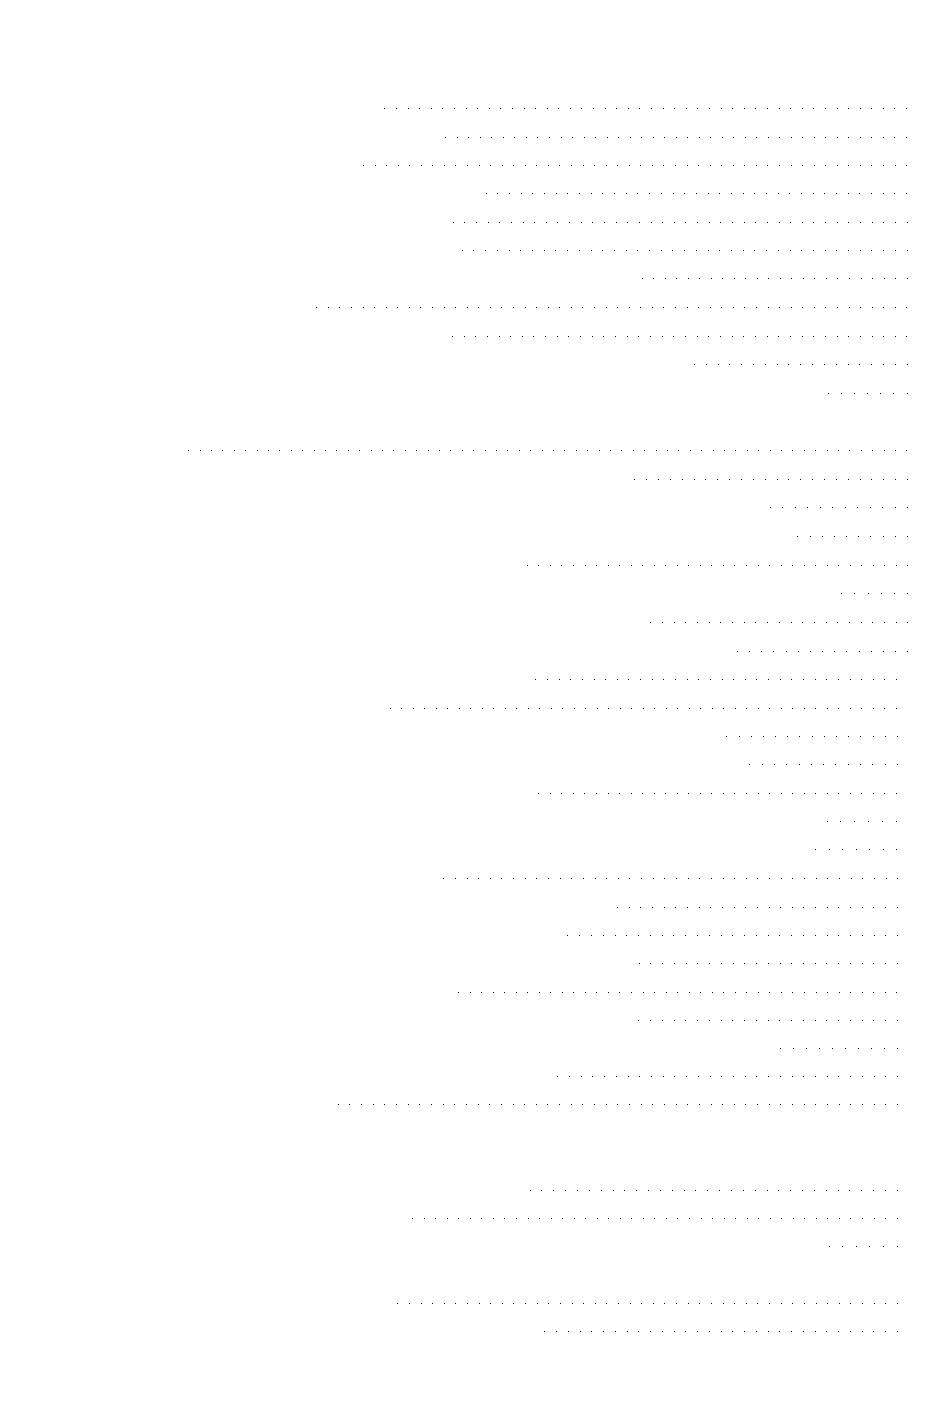 background - Схема подключения автосигнализации шериф 2500